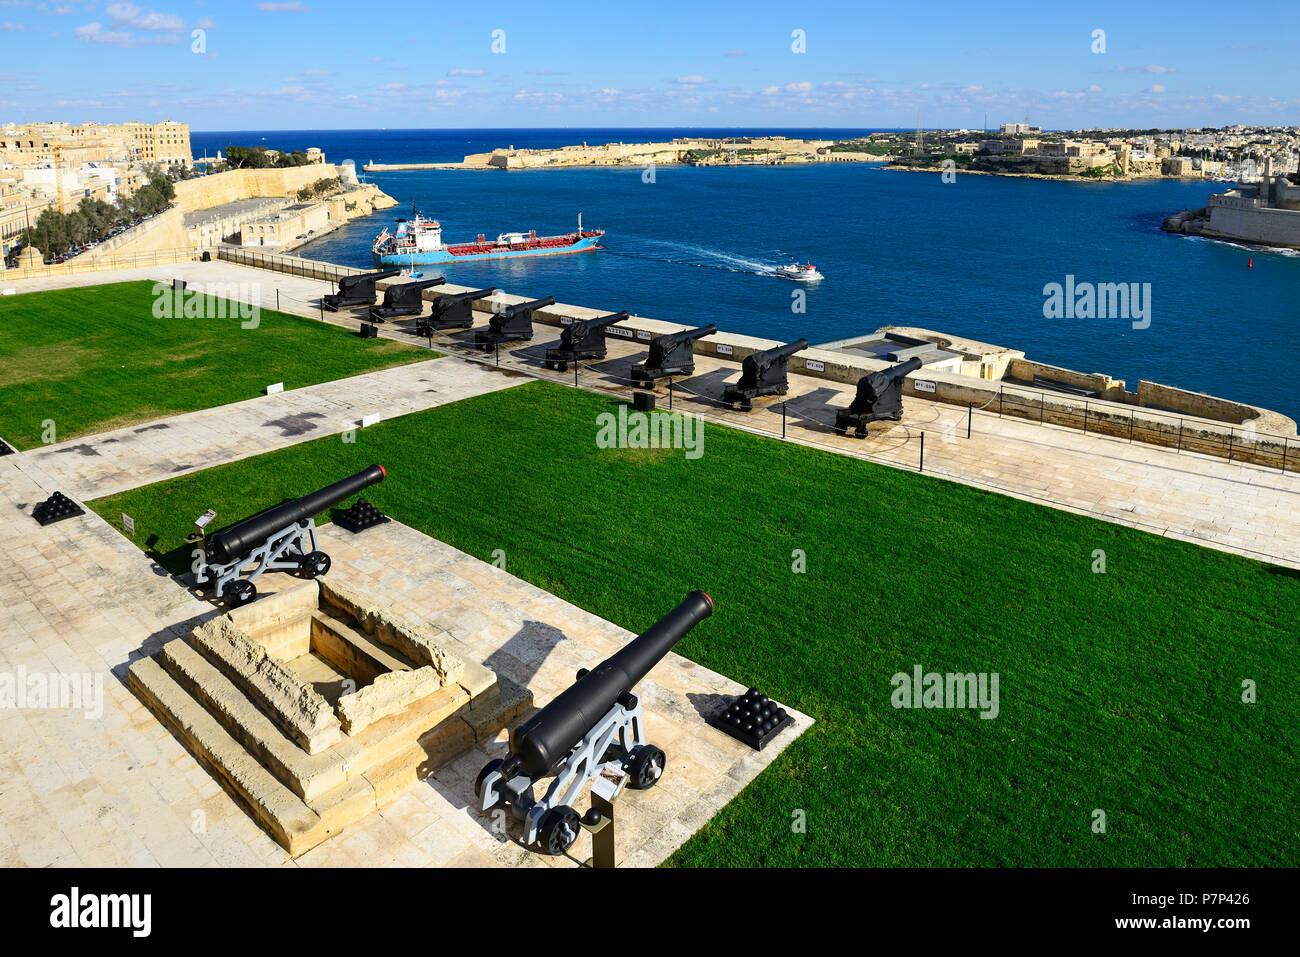 Cannons of Saluting Battery, Upper Barracca Garden, Valletta, Malta - Stock Image